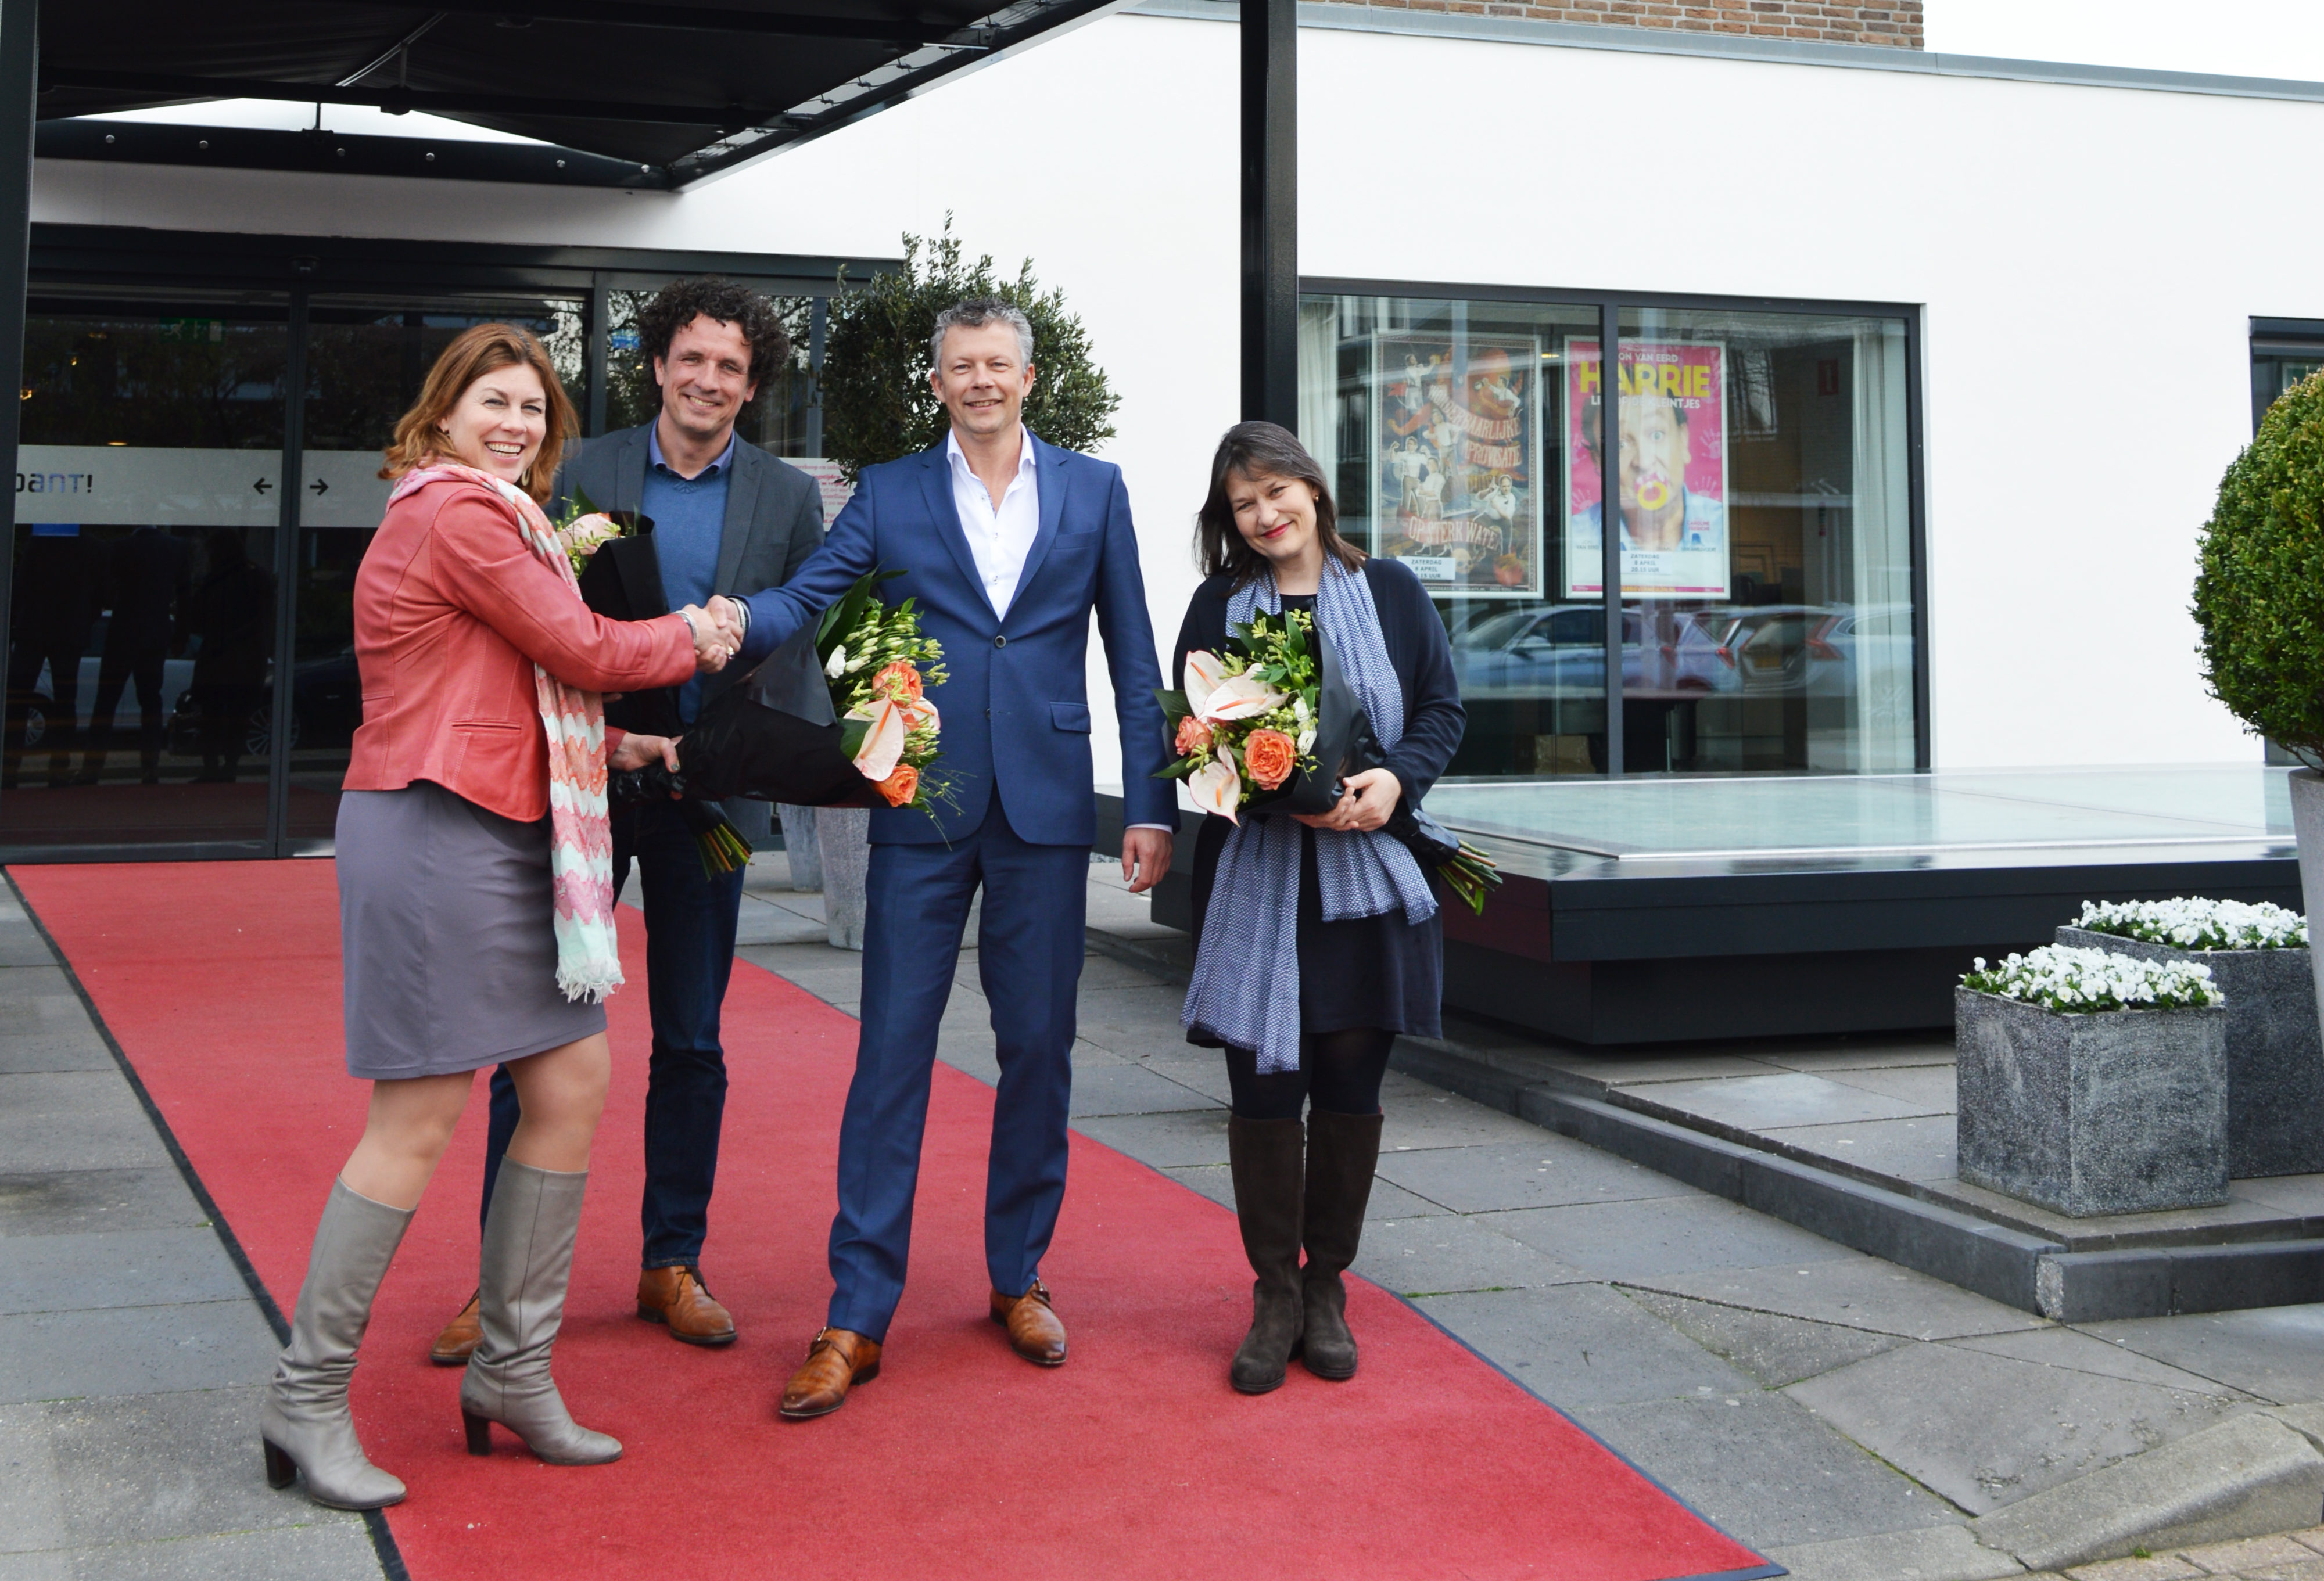 culturele samenwerking Grote Kerk Naarden Muiderslot Spant